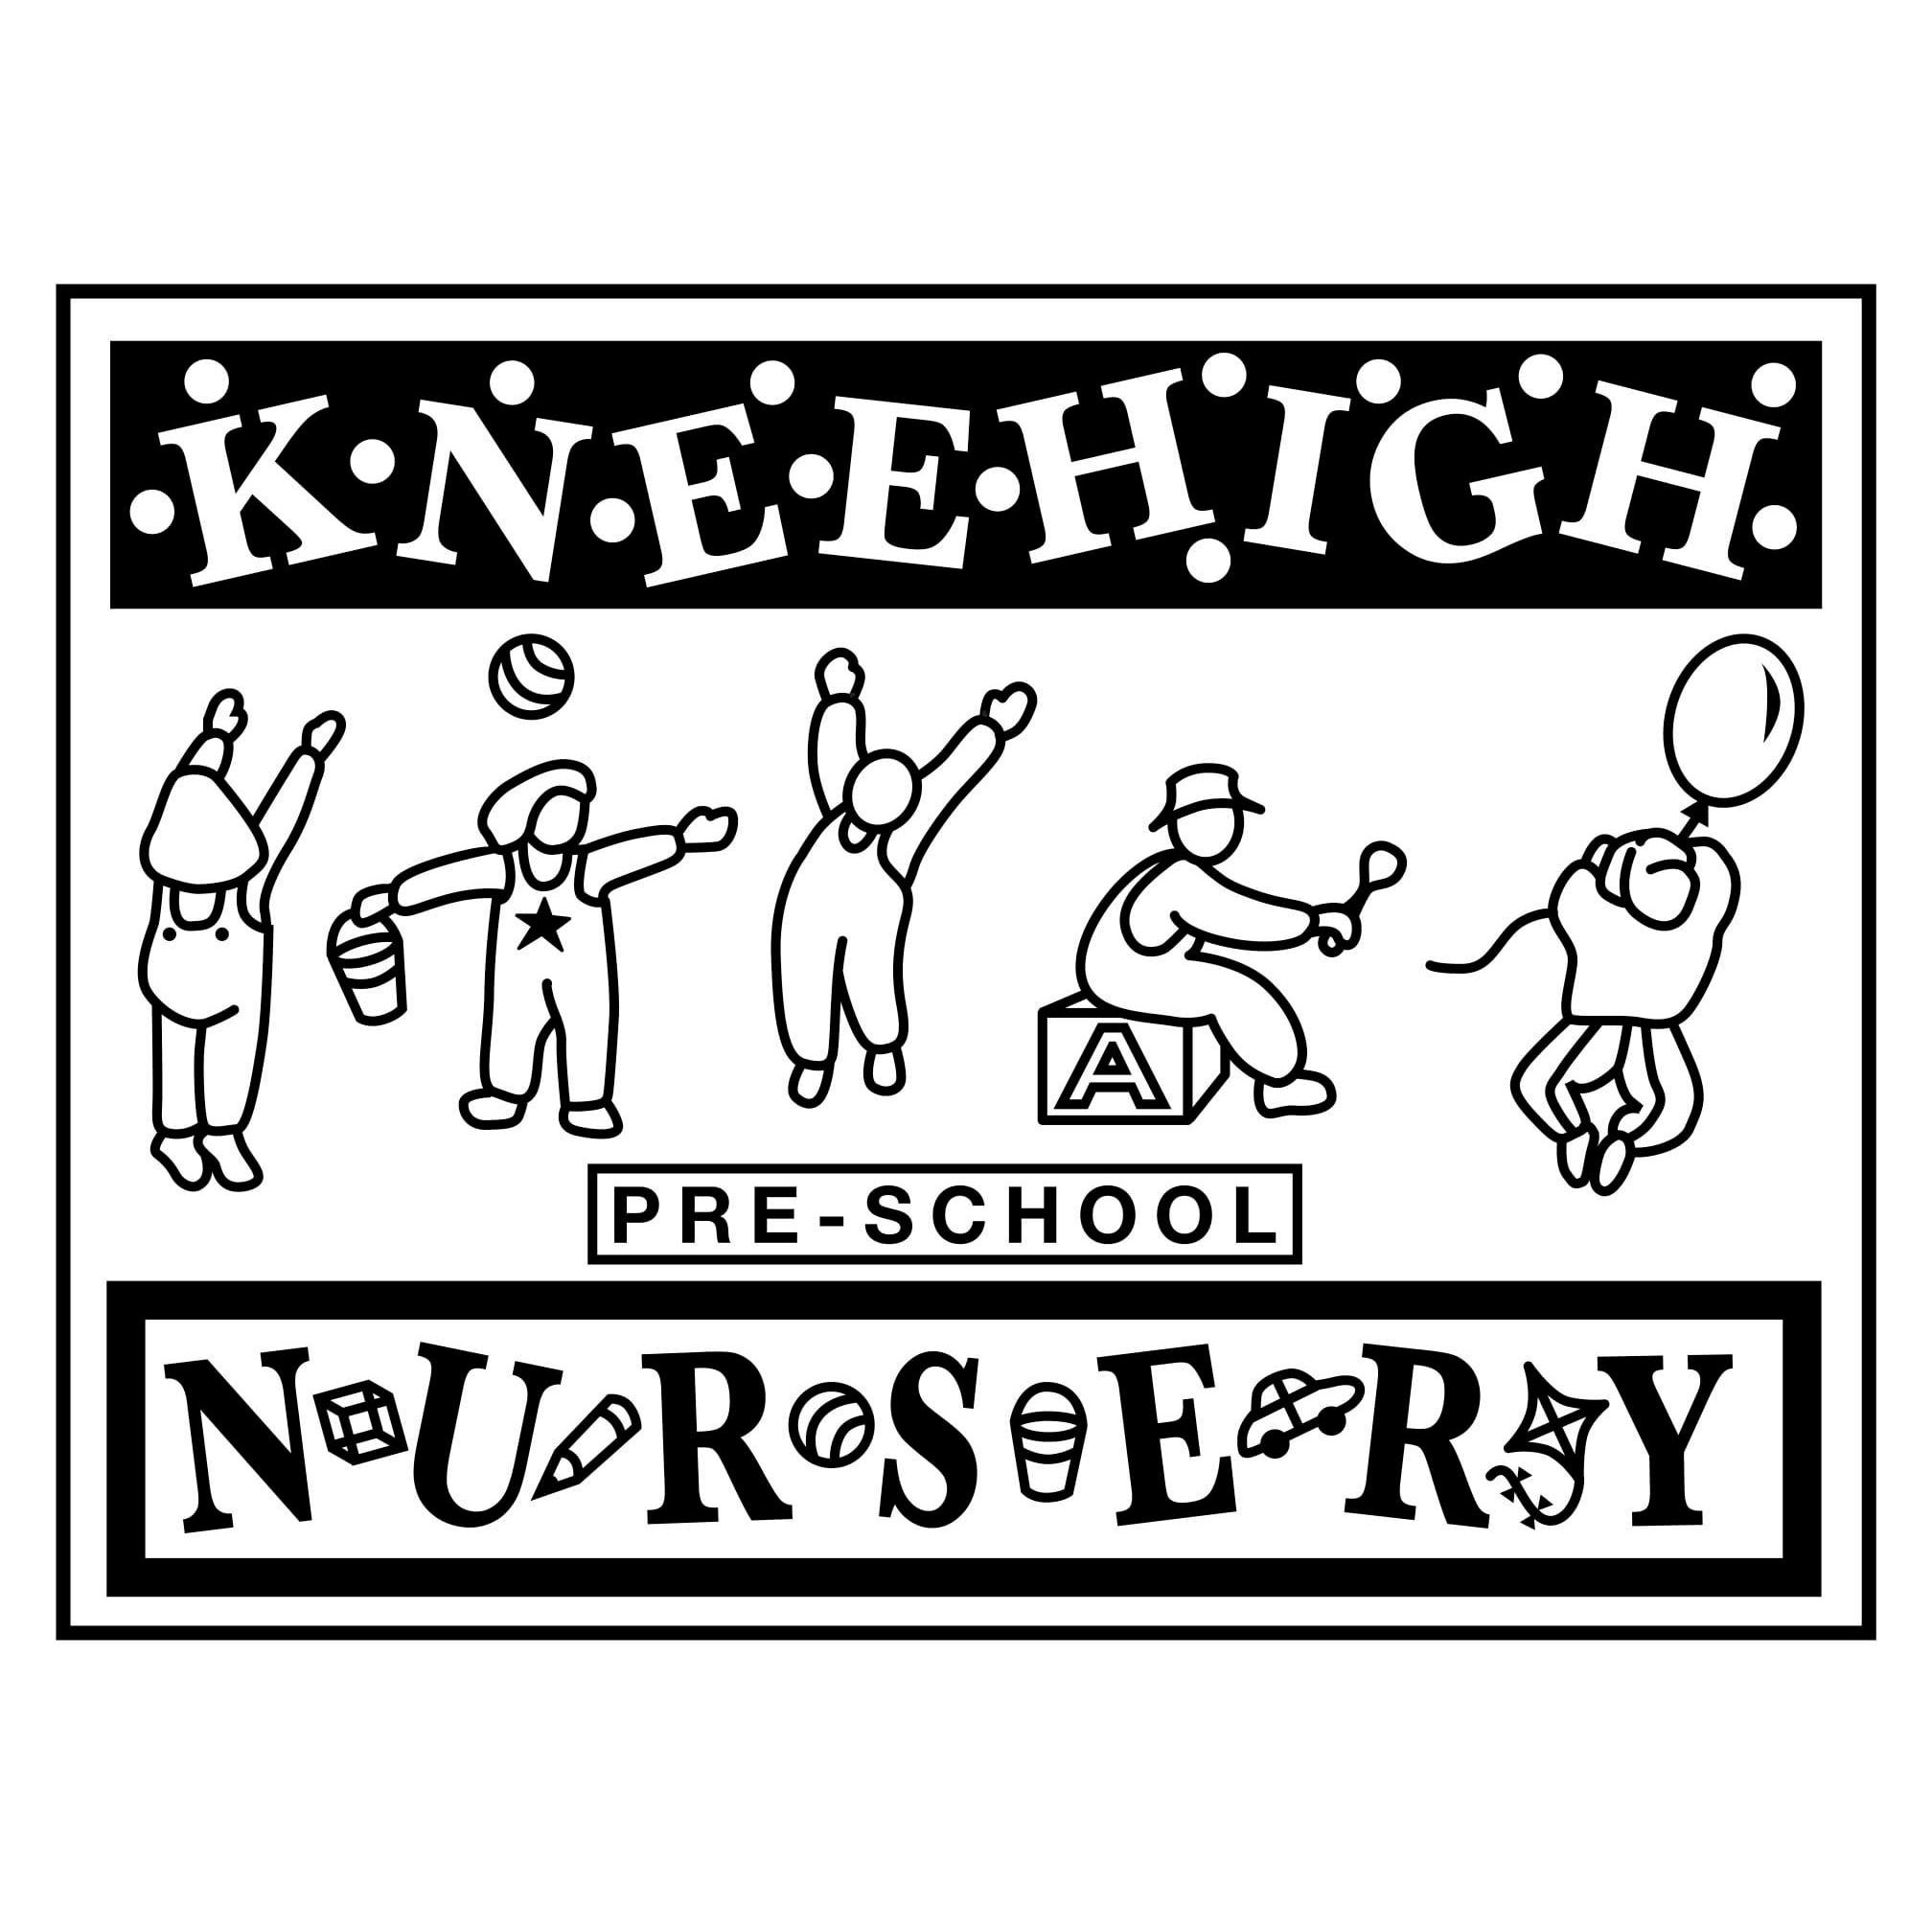 Kneehigh Nursery